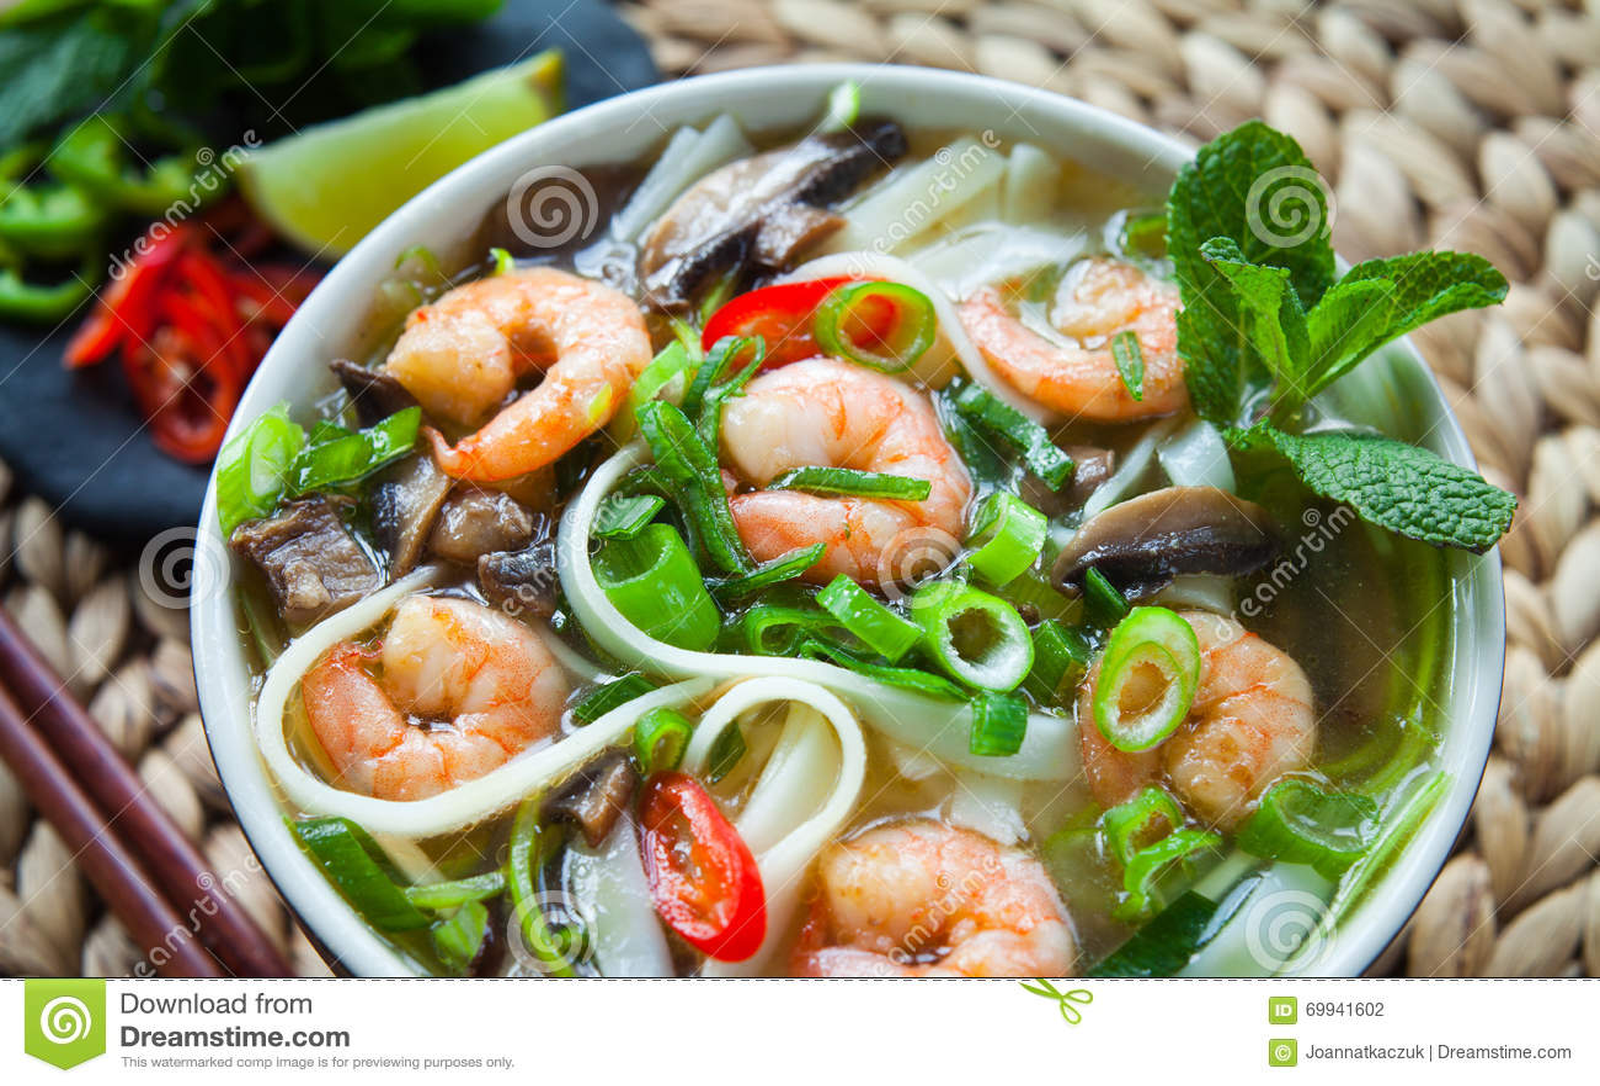 Въетнамский суп креветки креветки Tom pho yum